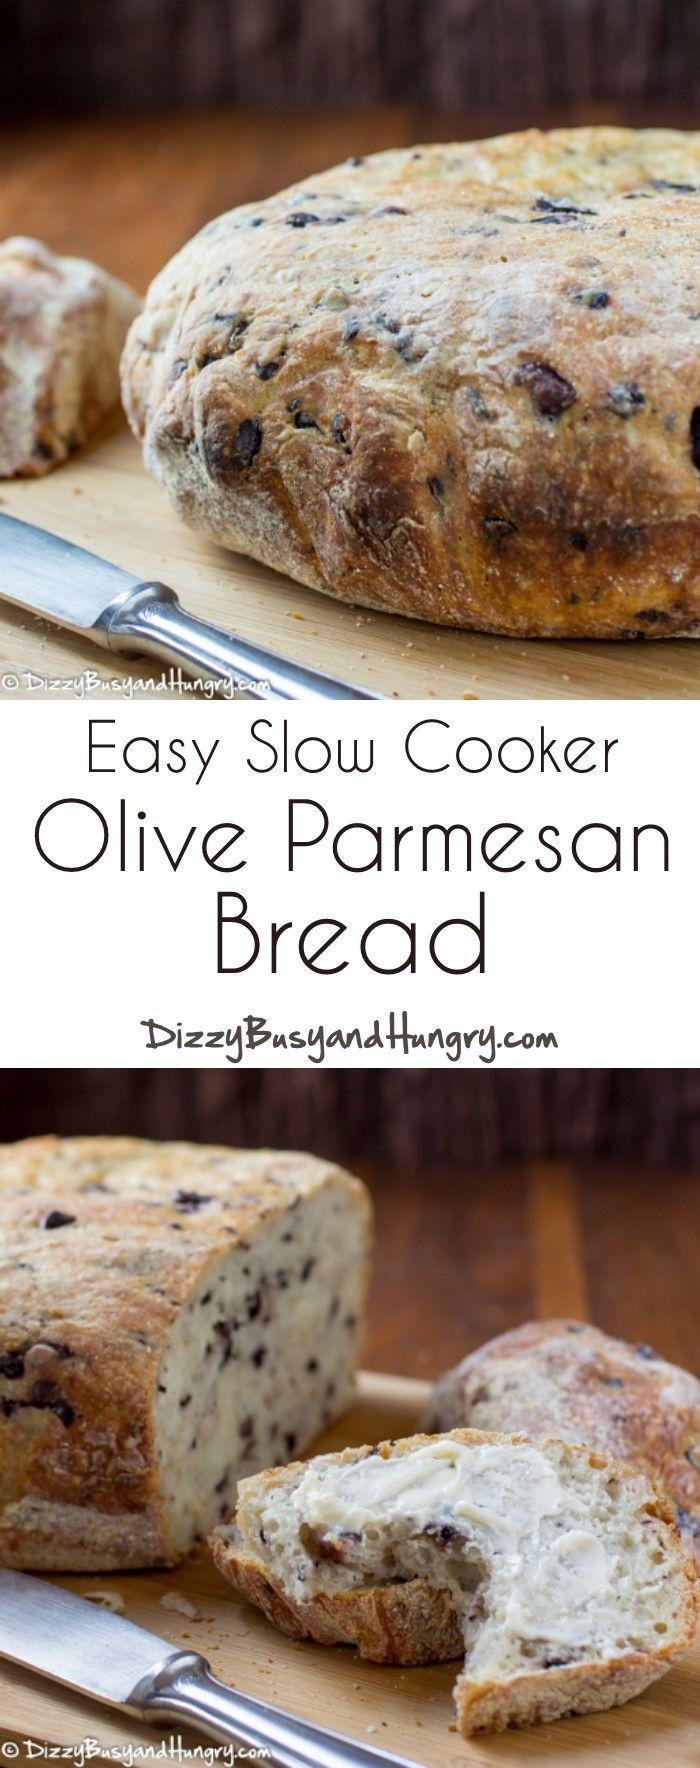 Easy Slow Cooker Olive Parmesan Bread http://www.dizzybusyandhungry.com/easy-slow-cooker-olive-parmesan-bread/